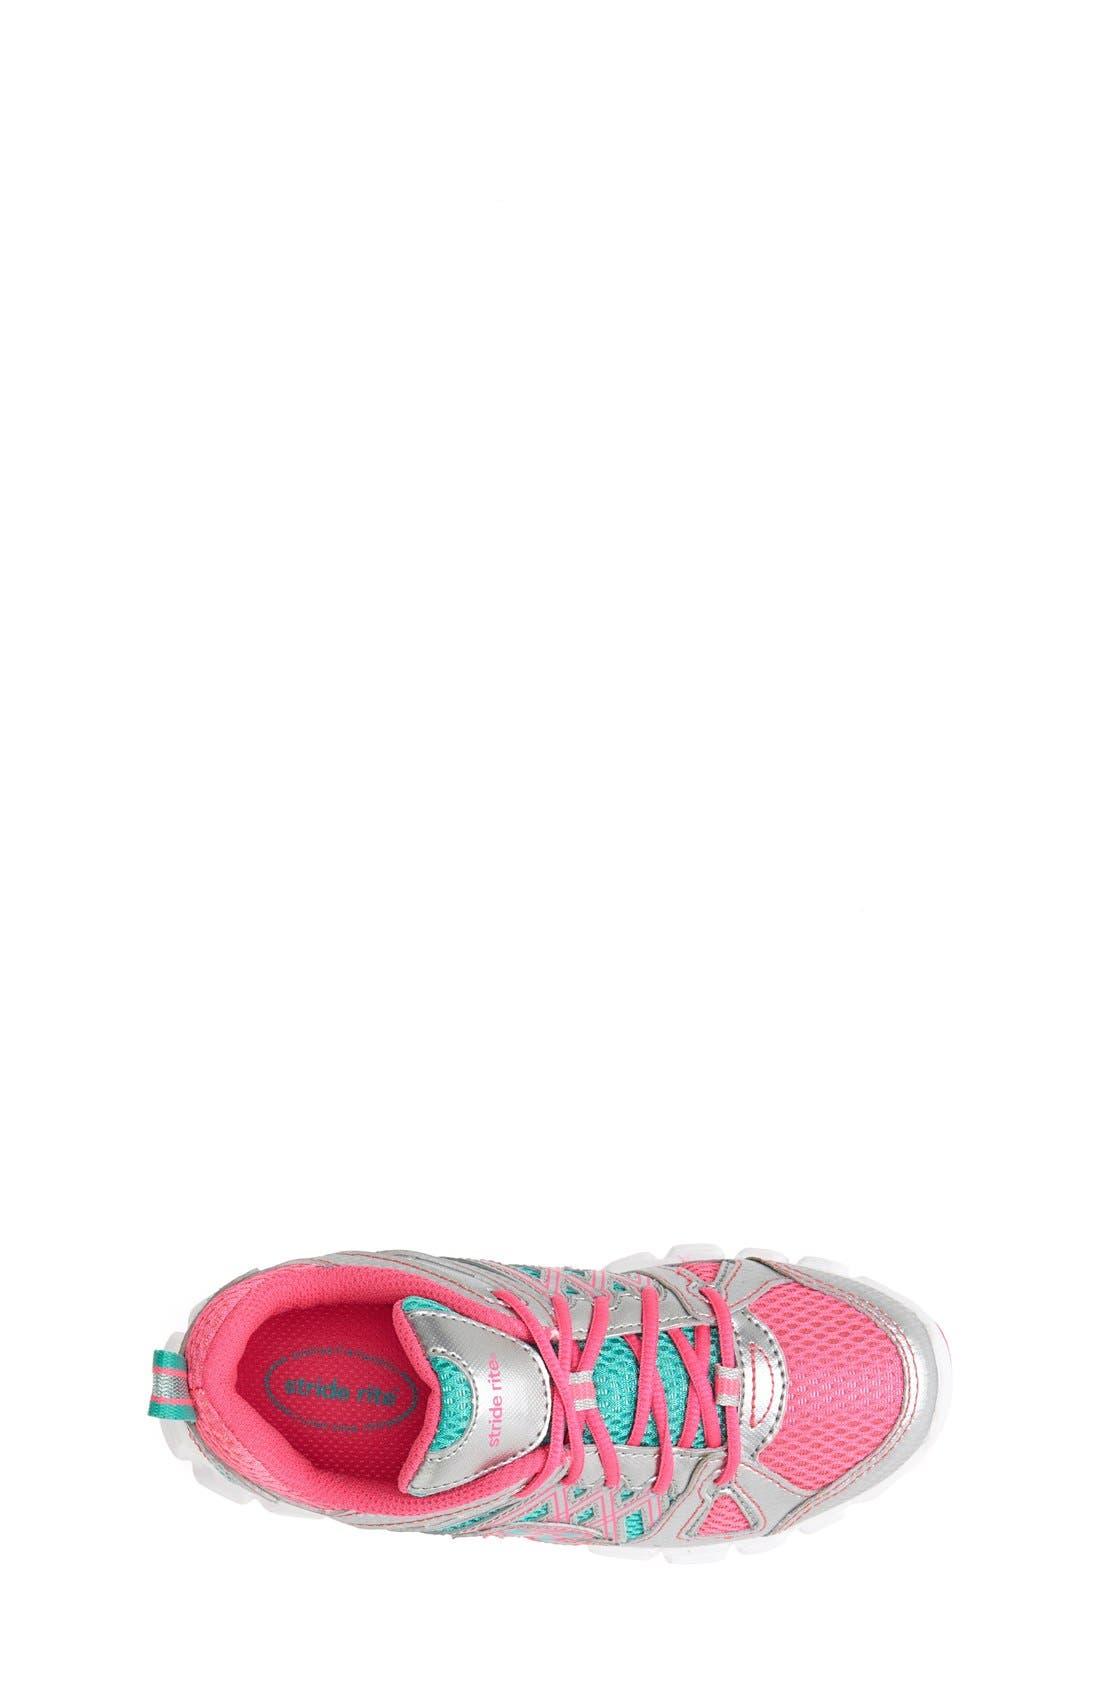 Alternate Image 3  - Stride Rite 'Propel' Sneaker (Toddler, Little Kid & Big Kid)